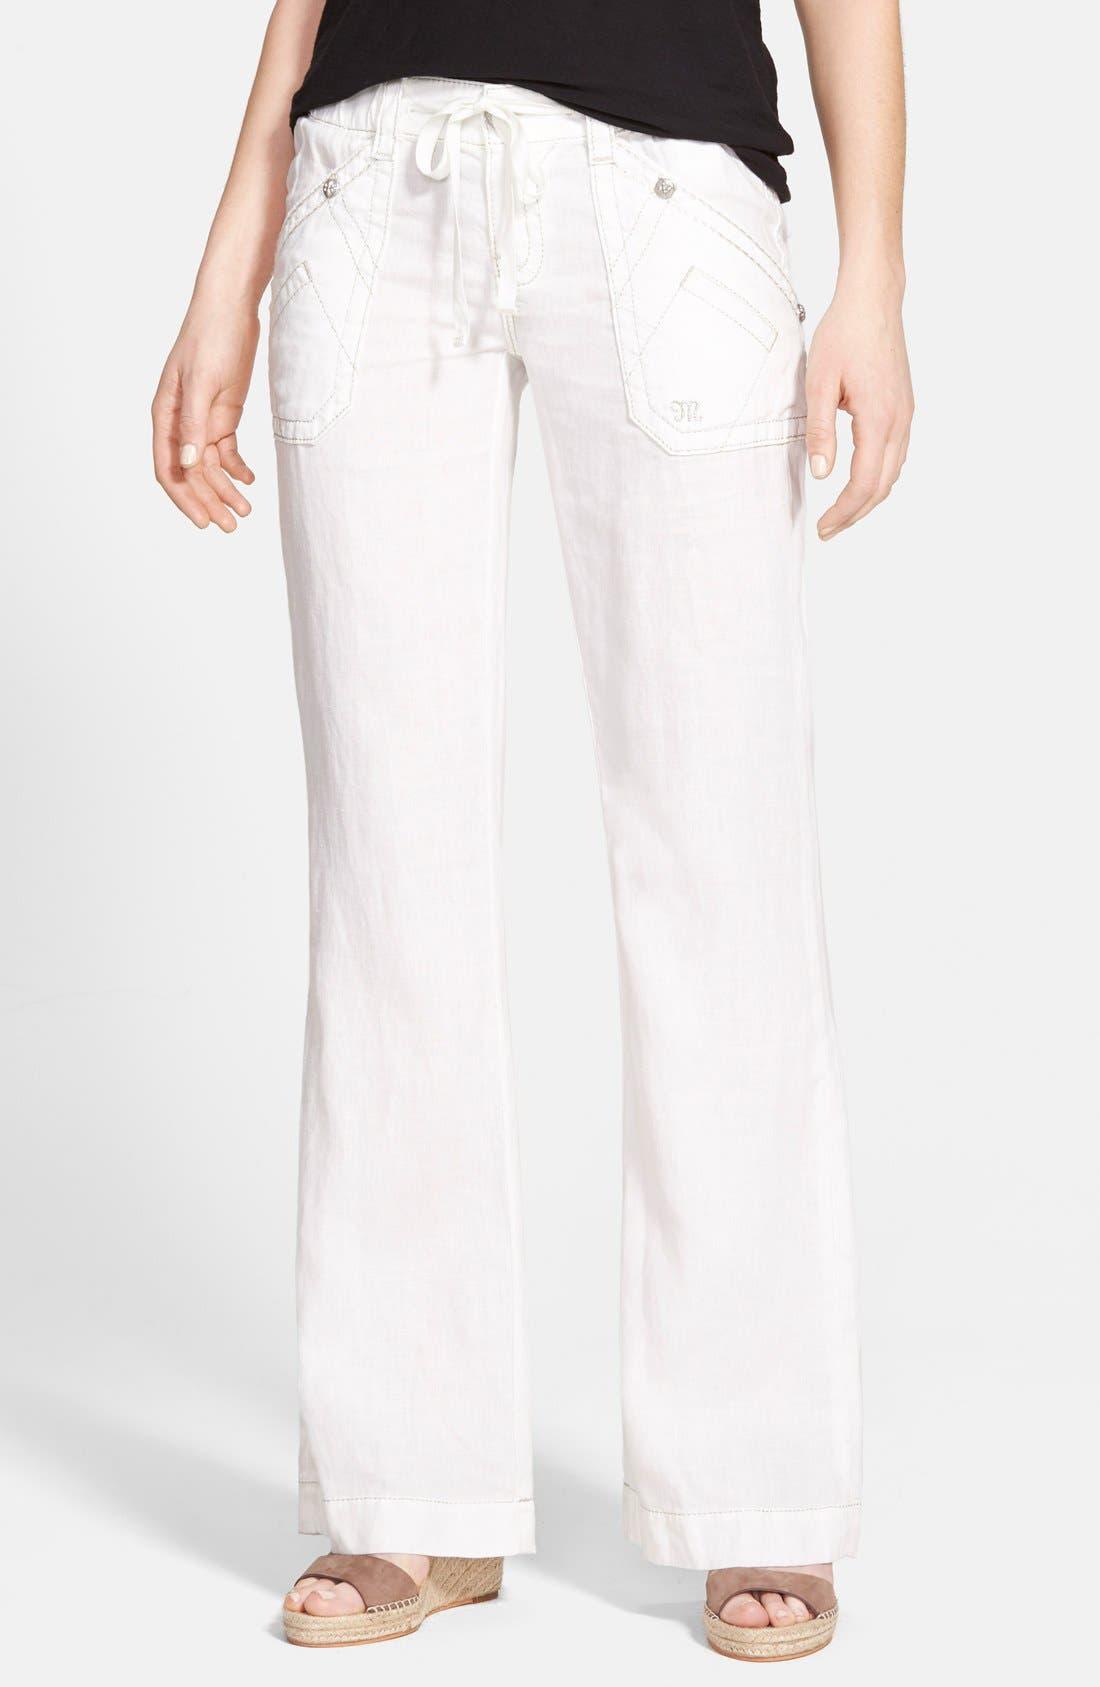 Alternate Image 1 Selected - Miss Me Metallic Stitch Wide Leg Linen Pants